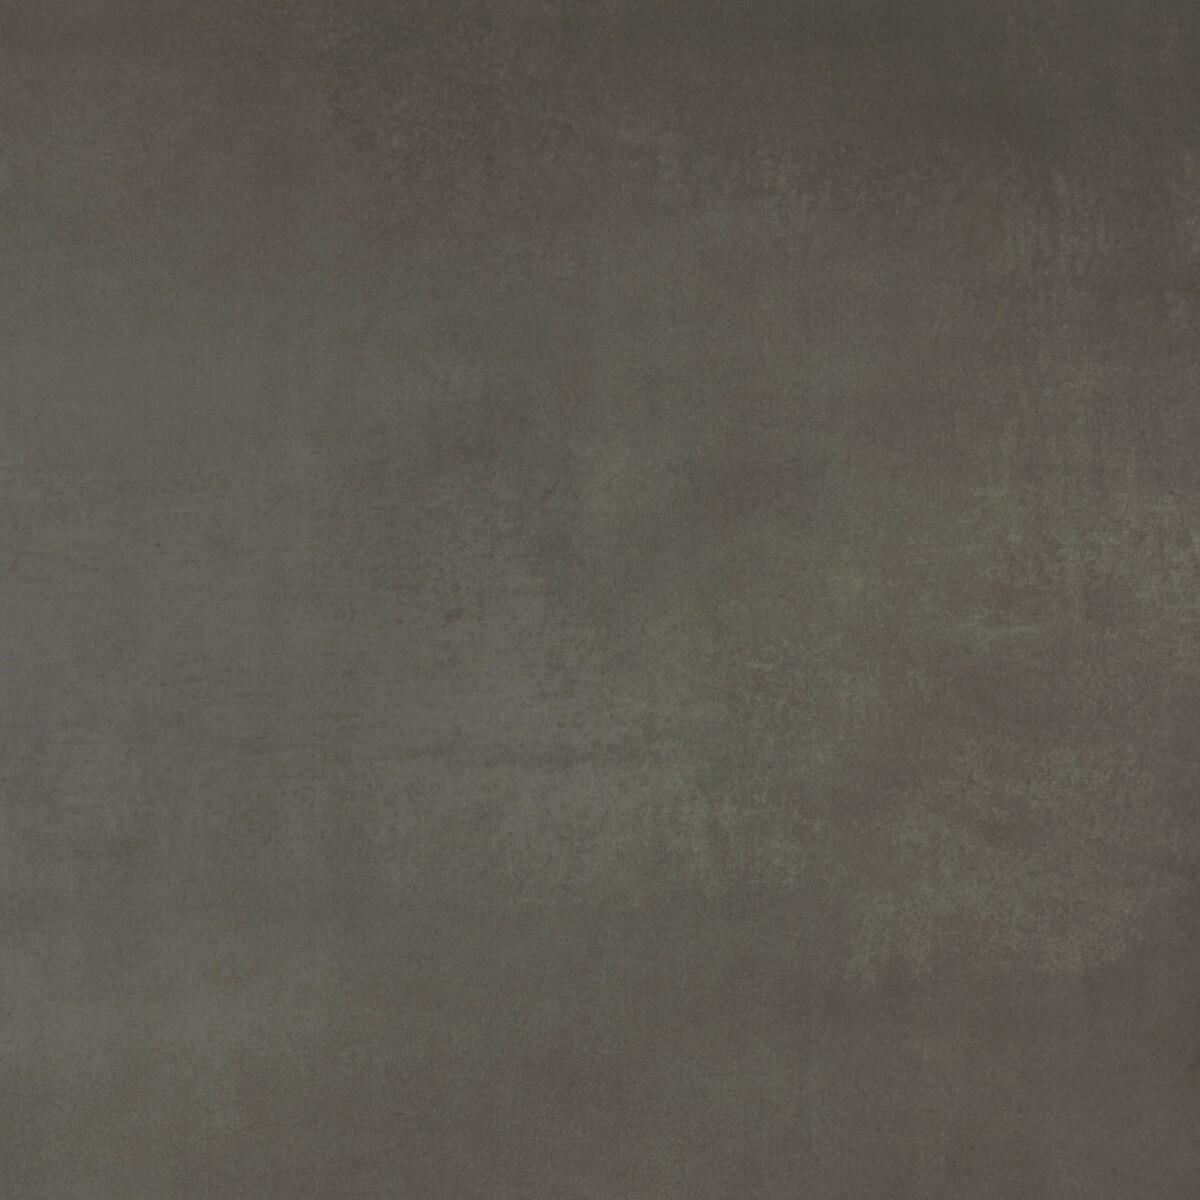 Dlažba Rako Extra hnedá 60x60 cm mat FINEZA91494